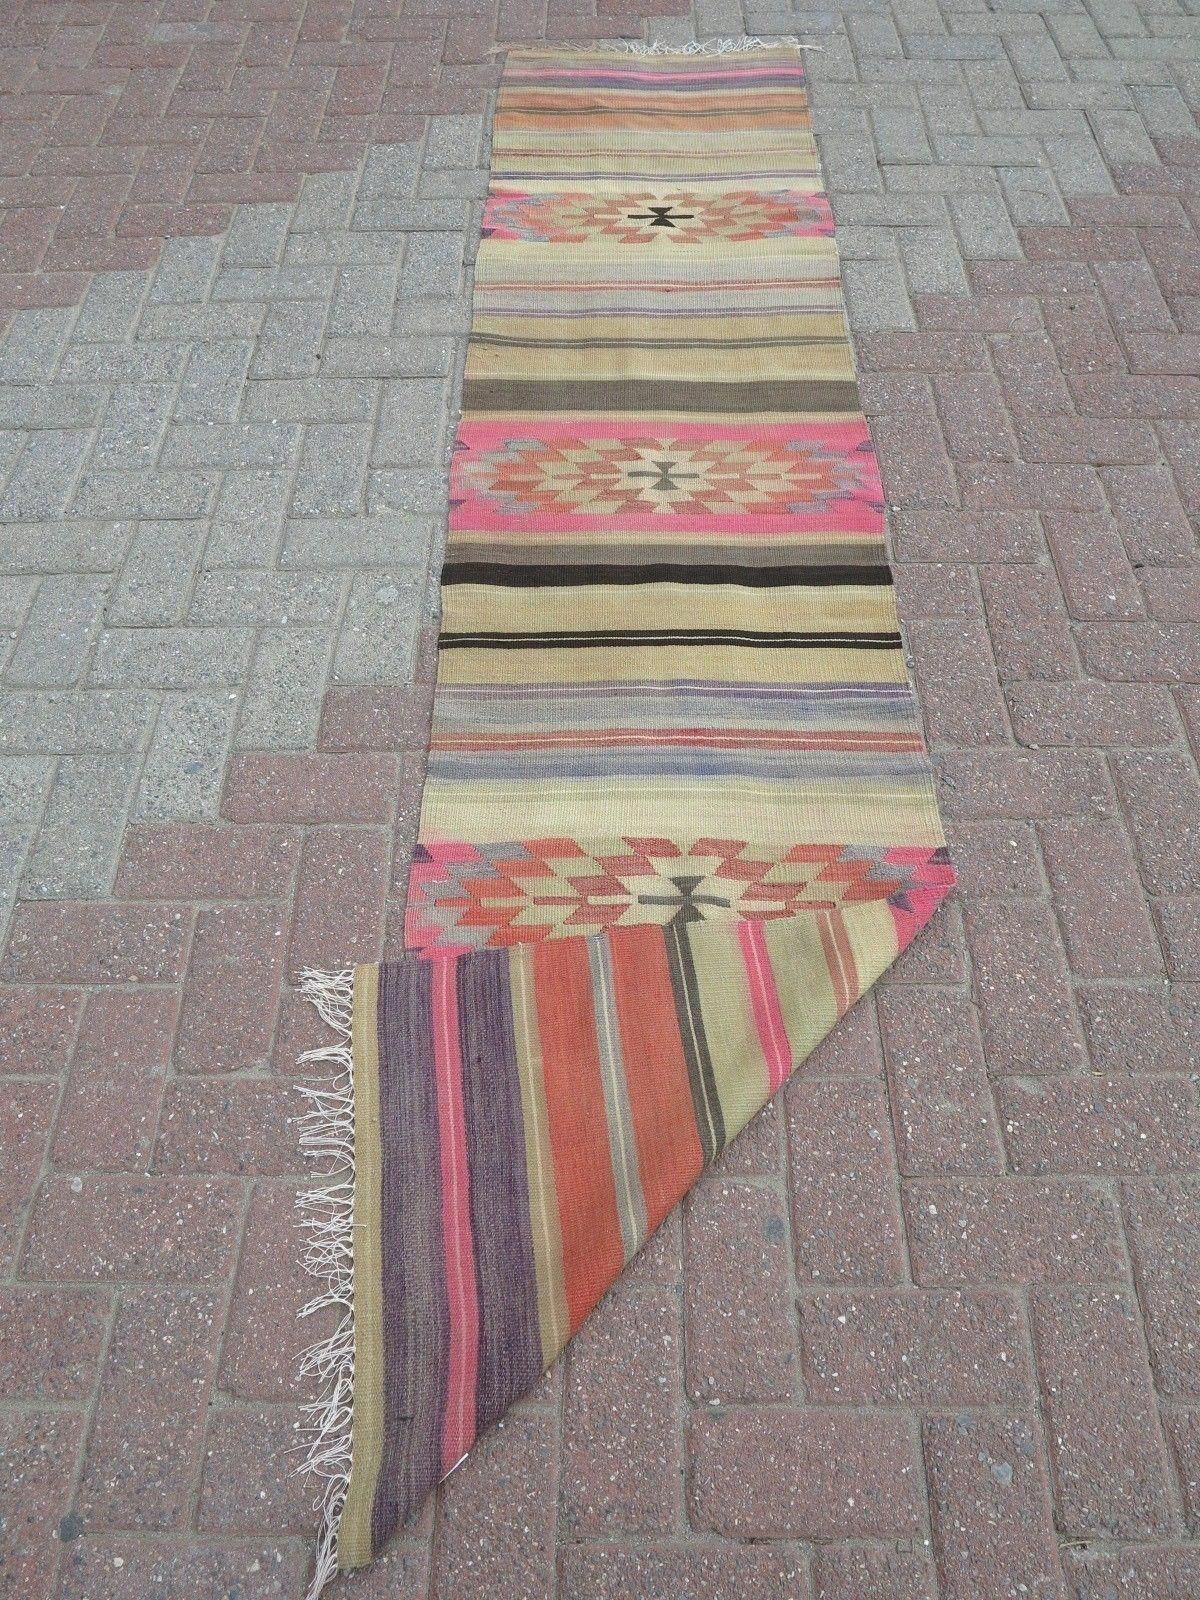 Best Carpet Runners Hallways Lowes Carpetrunnersforyachts Runnersrugscheap Rugs On Carpet Kilim 640 x 480